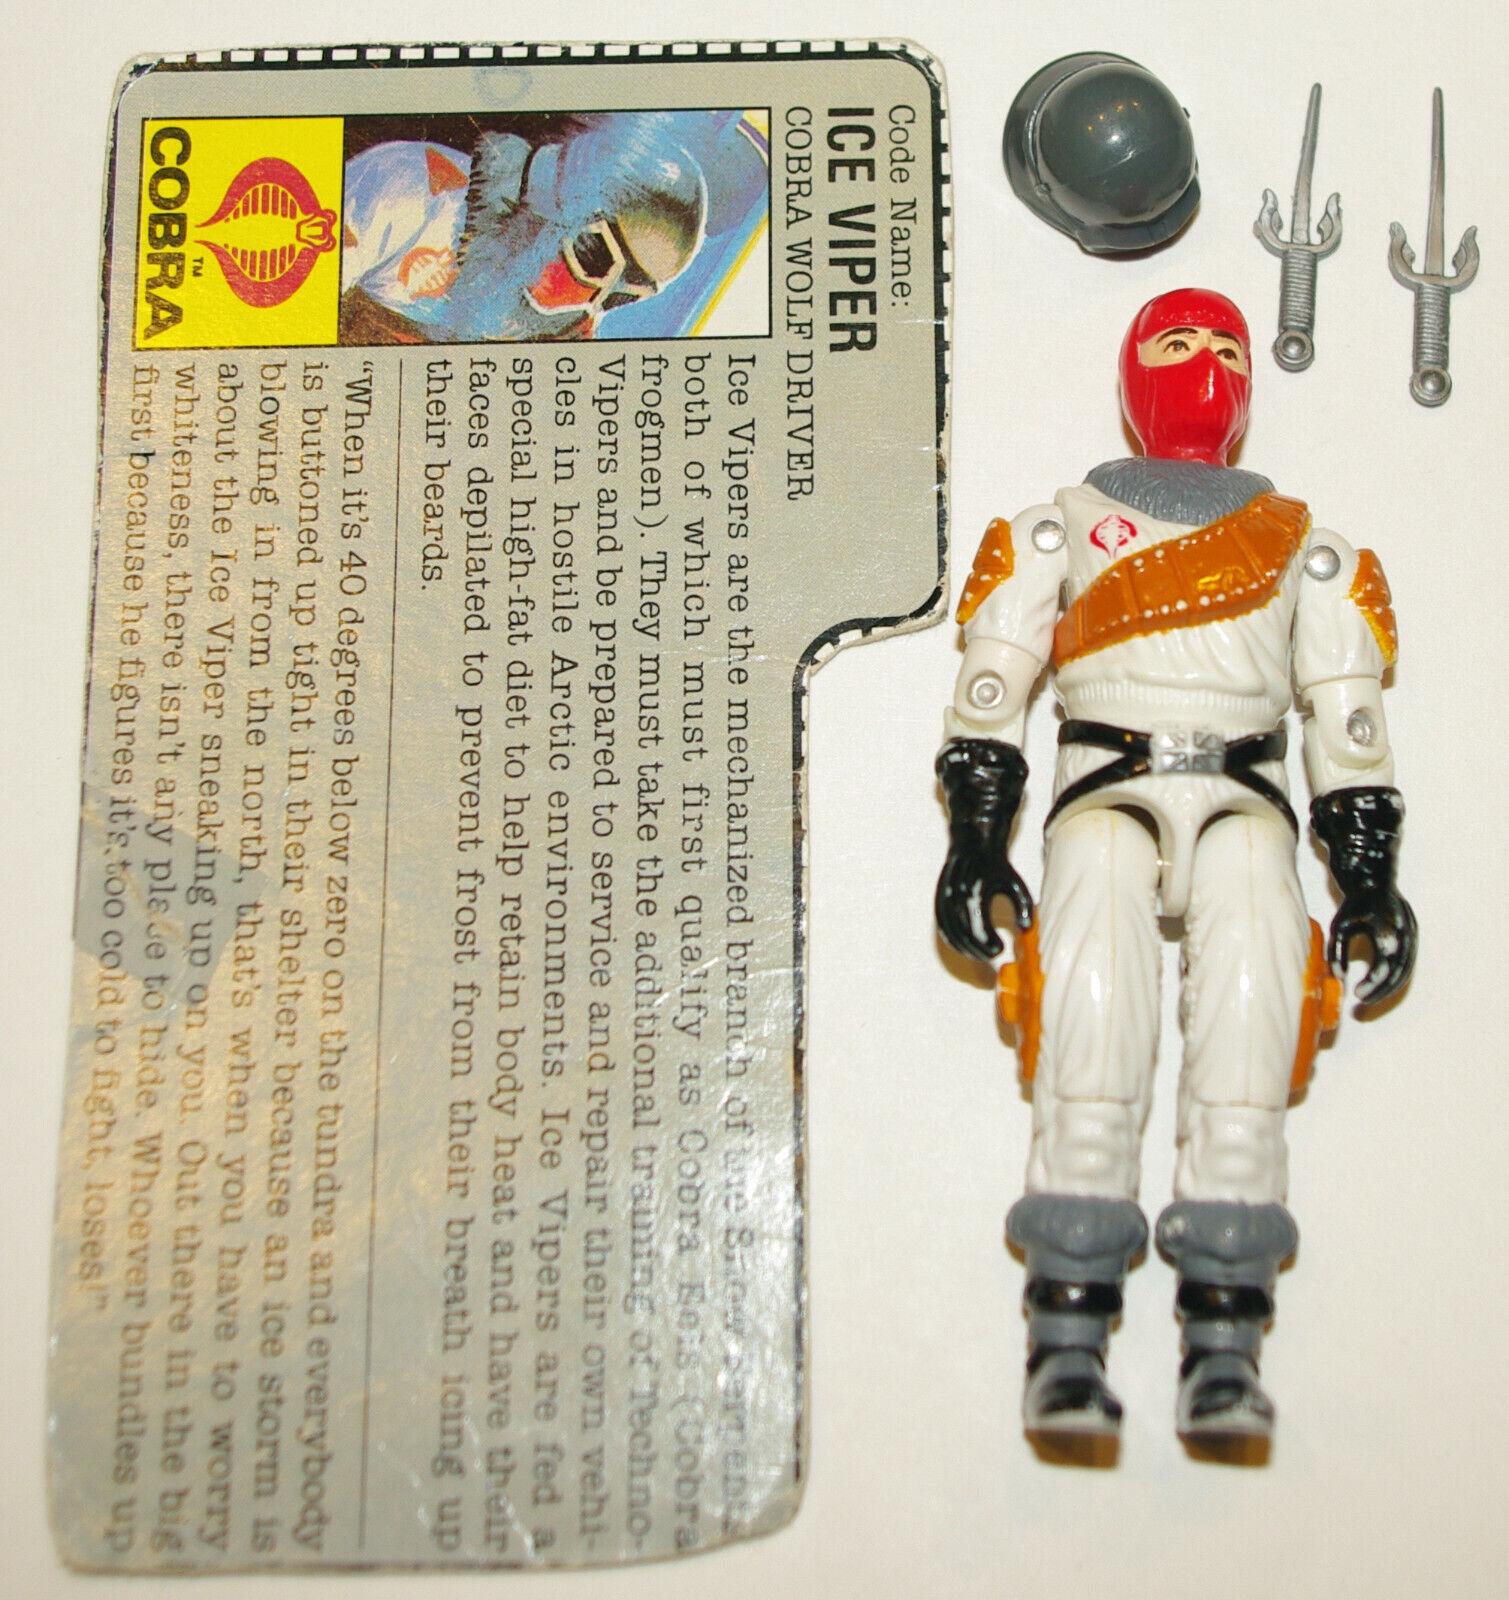 GI Joe 1987 Ice Viper (v1) - Complete with File Card, Helmet, Two Sai Daggers